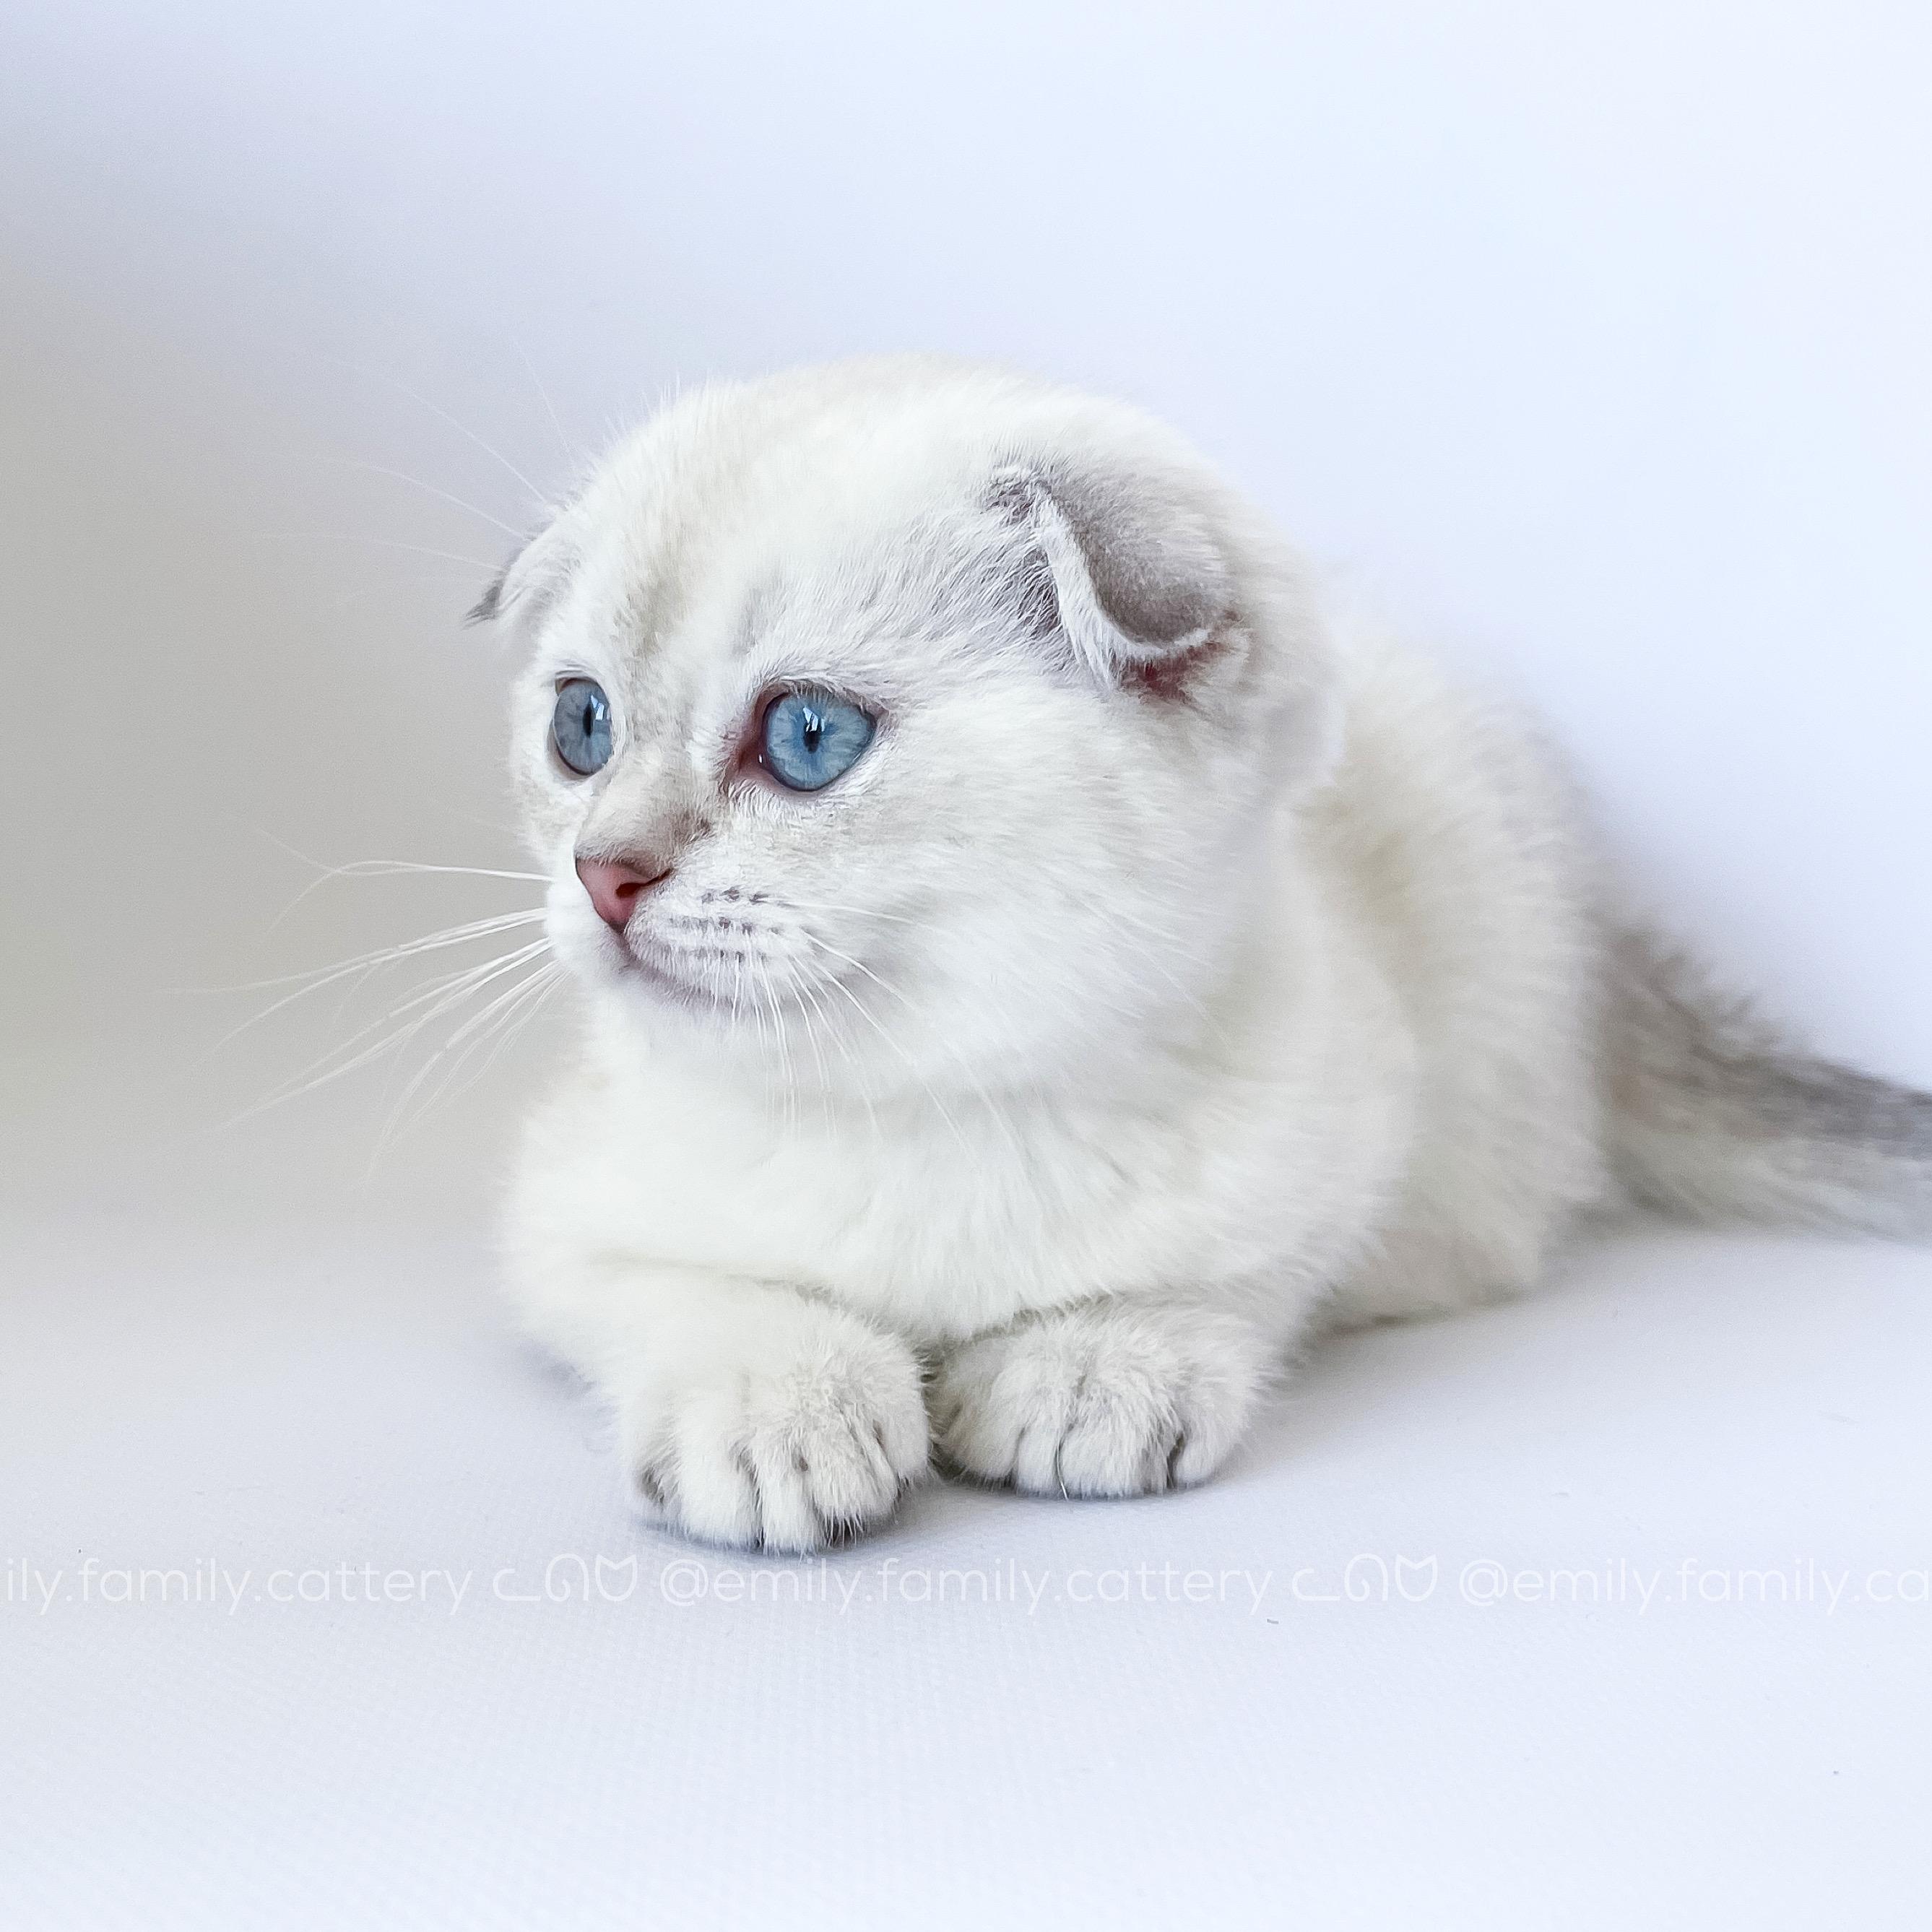 Our kitten - Alaska